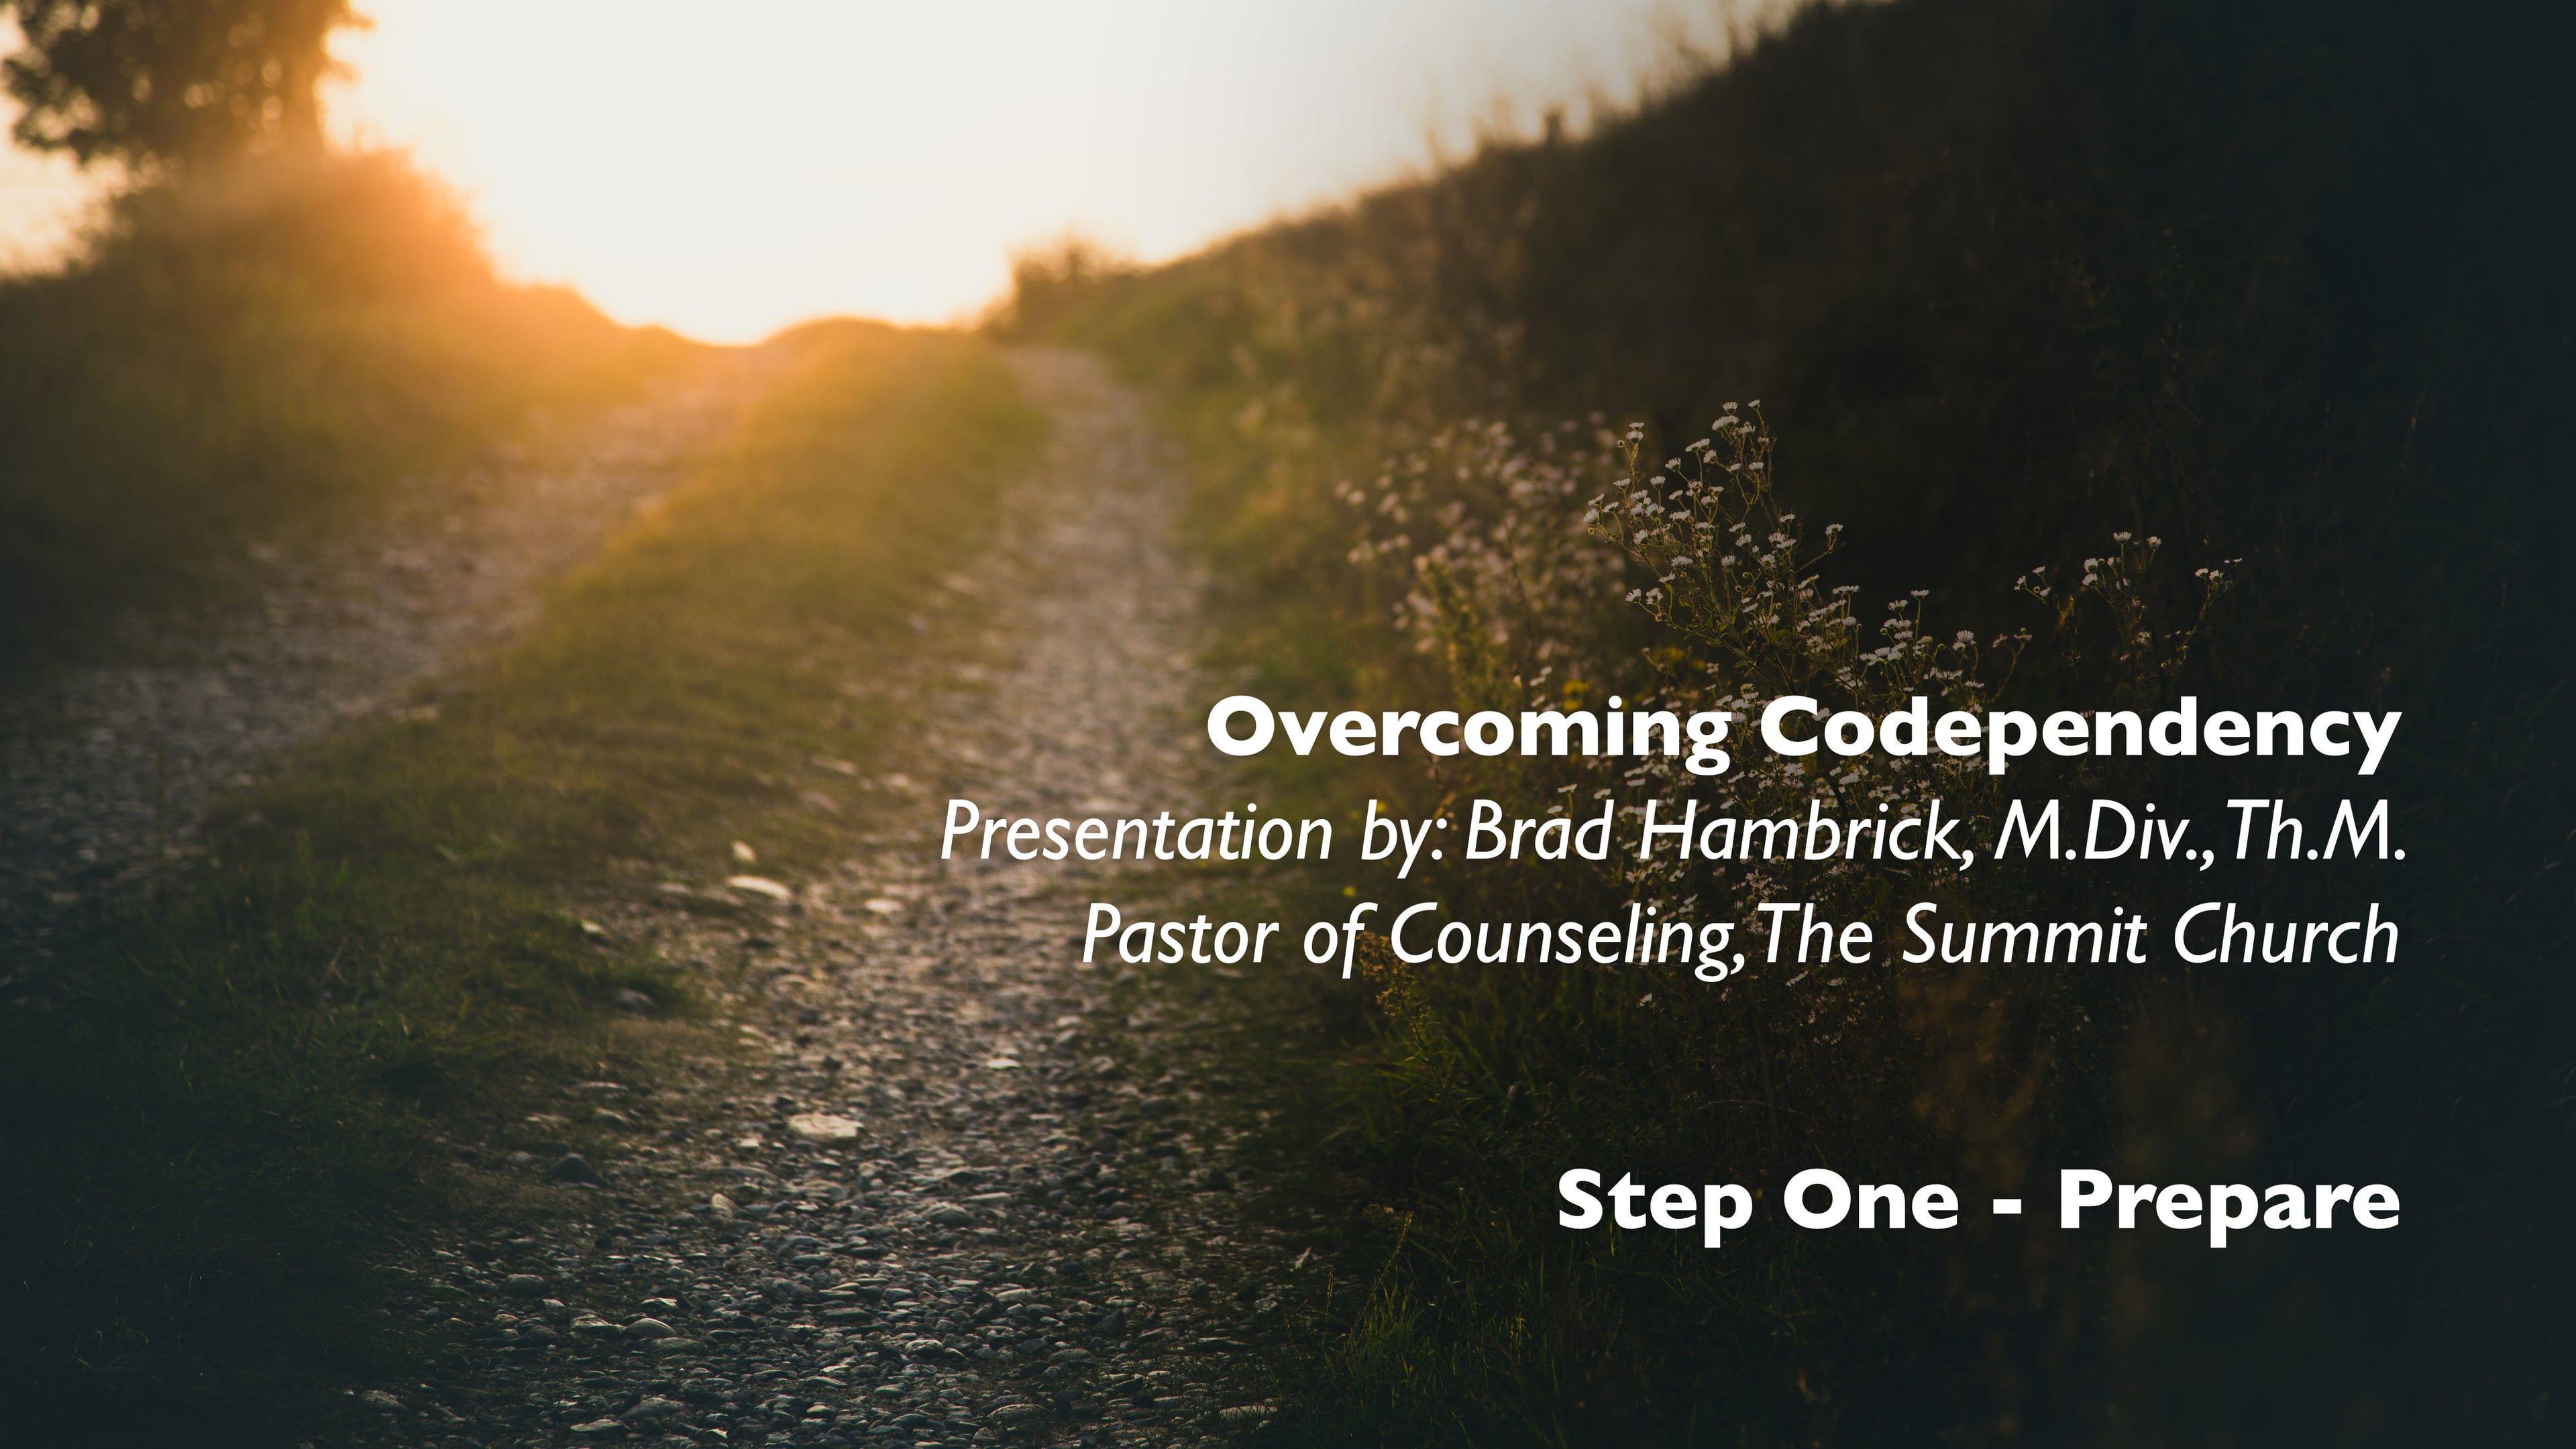 Overcoming Codependency